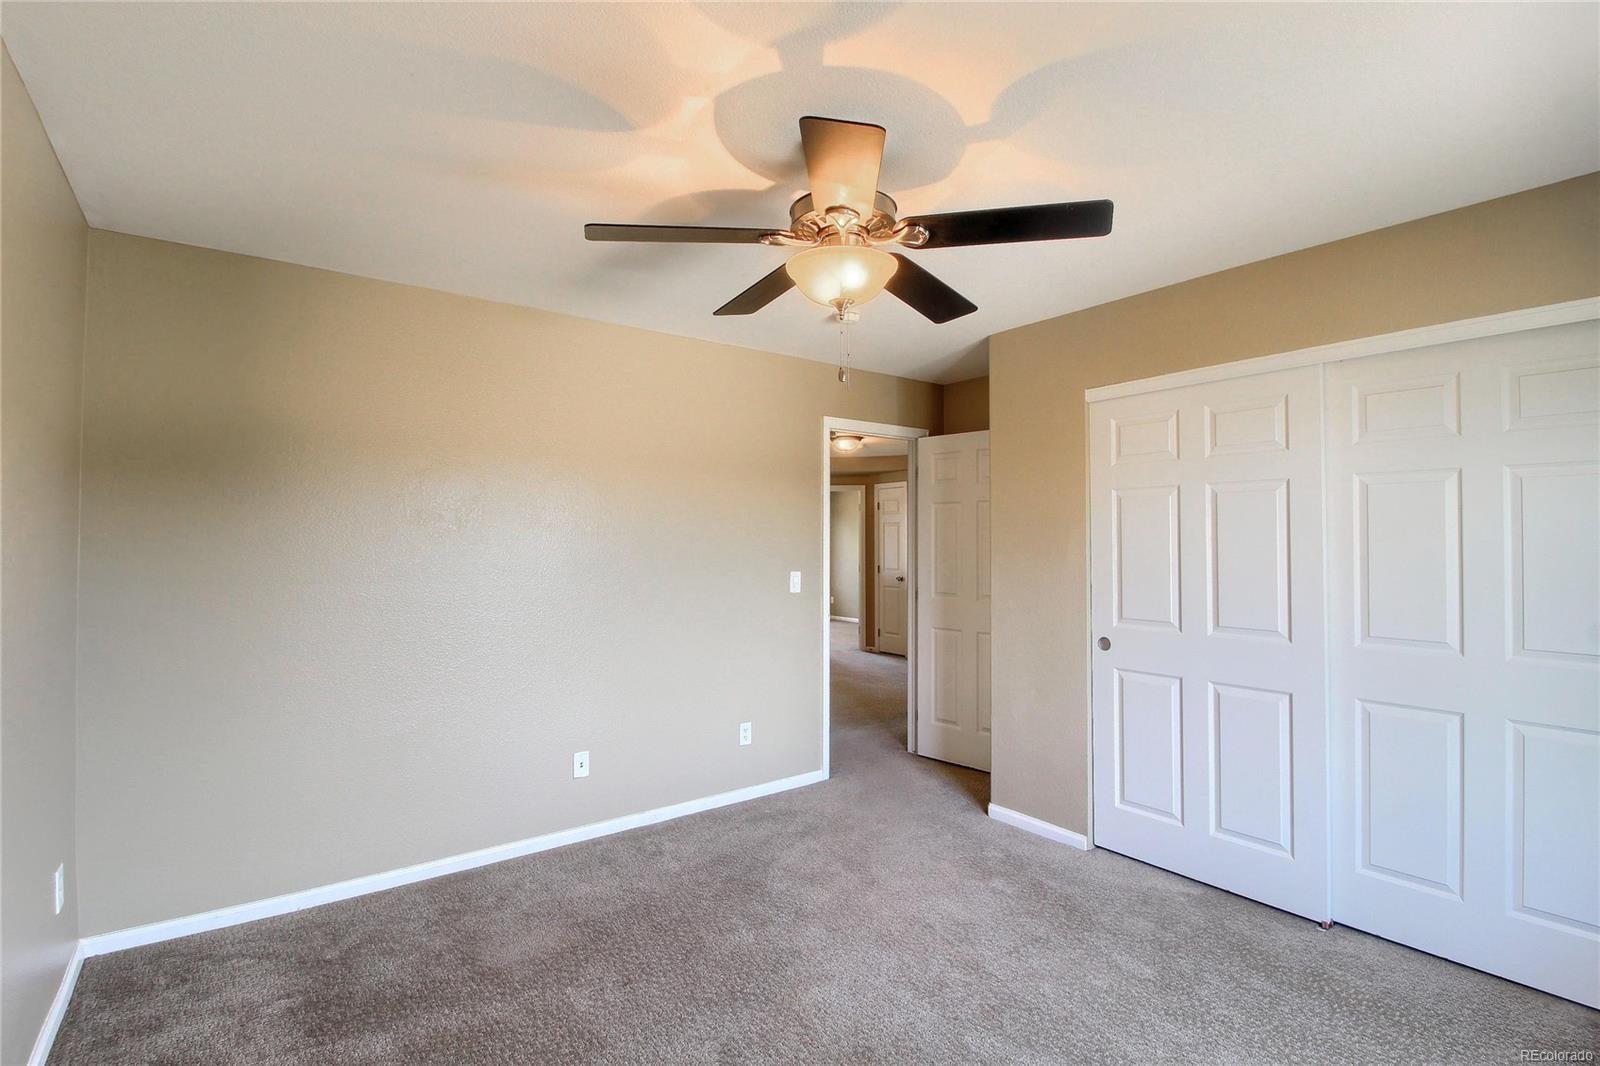 MLS# 3018887 - 28 - 10677 Cedarcrest Circle, Highlands Ranch, CO 80130